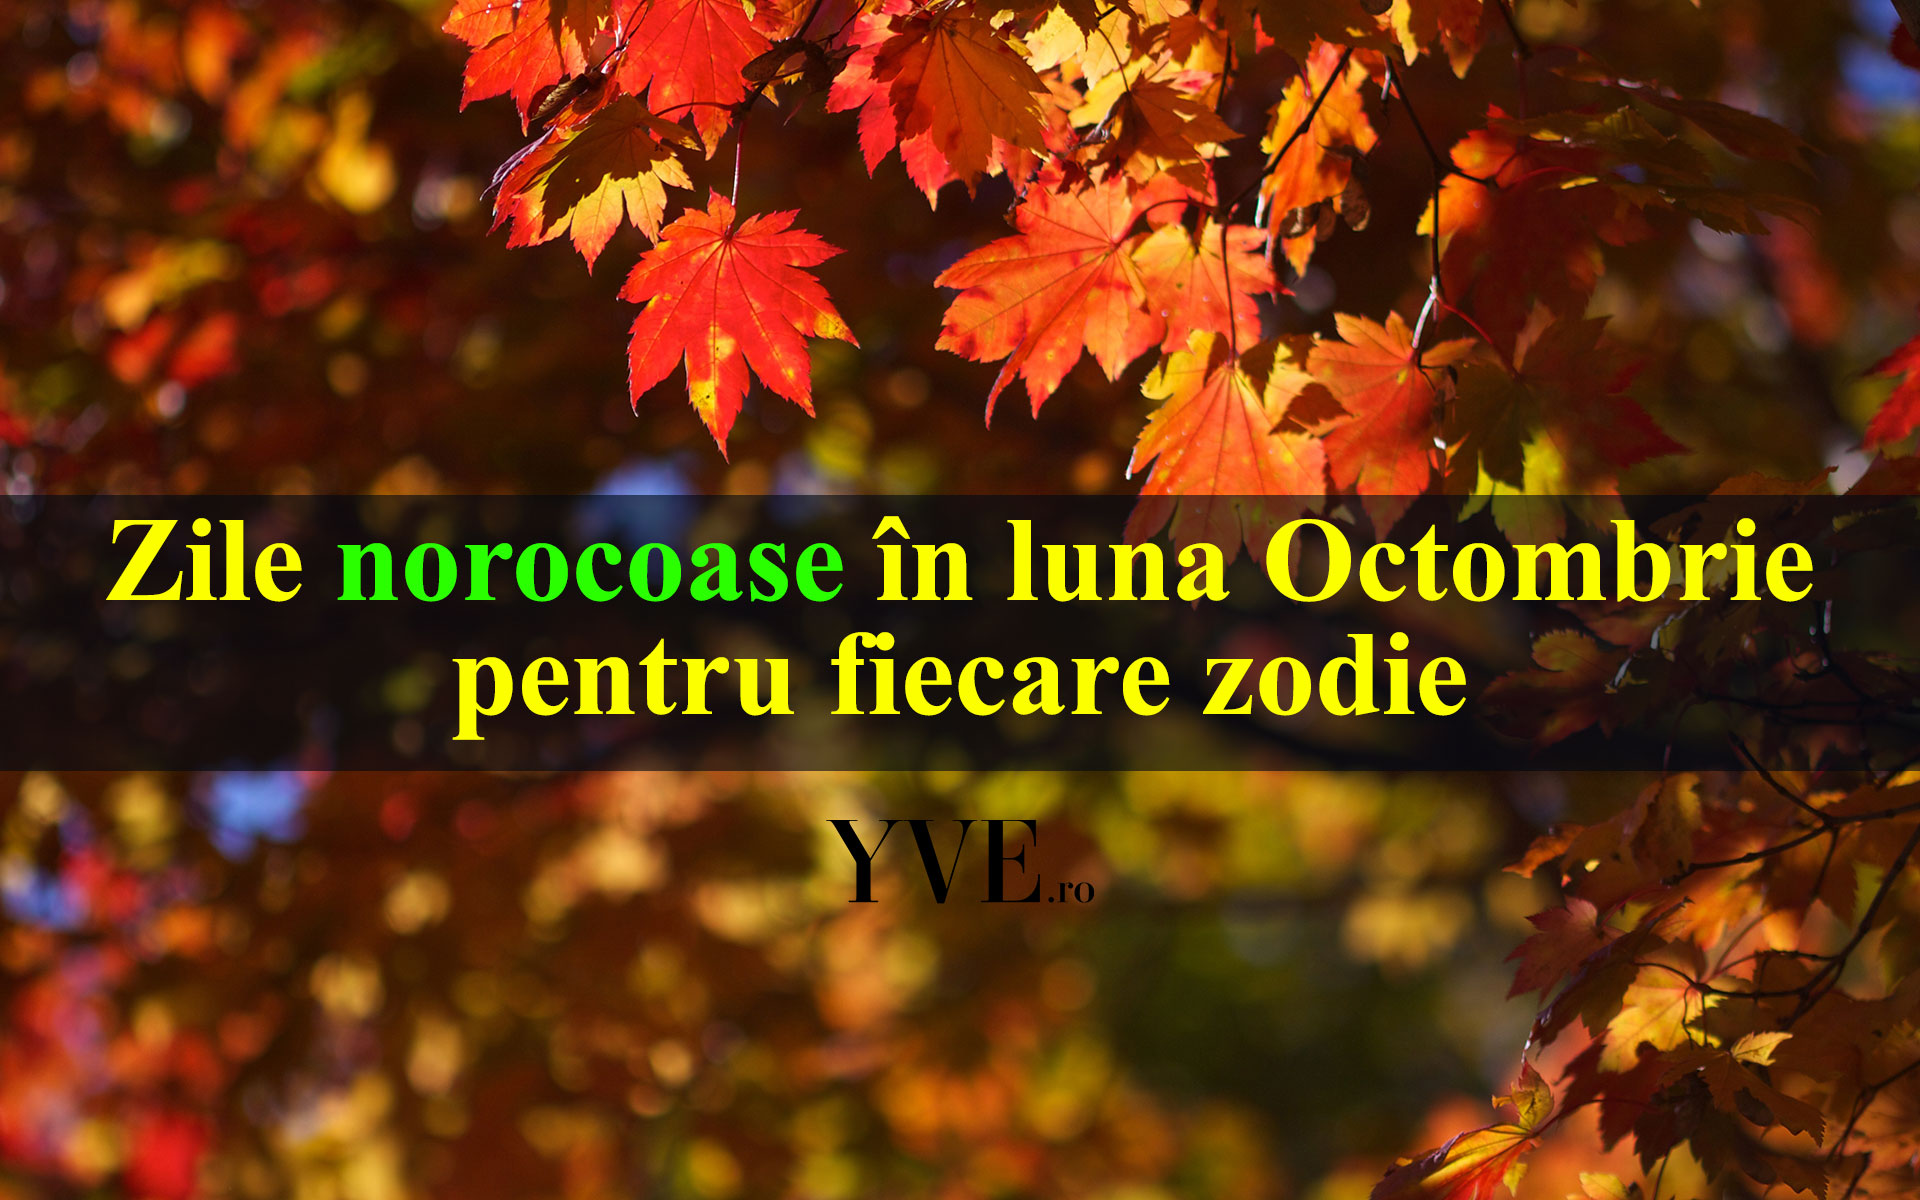 Zile norocoase in luna Octombrie pentru fiecare zodie